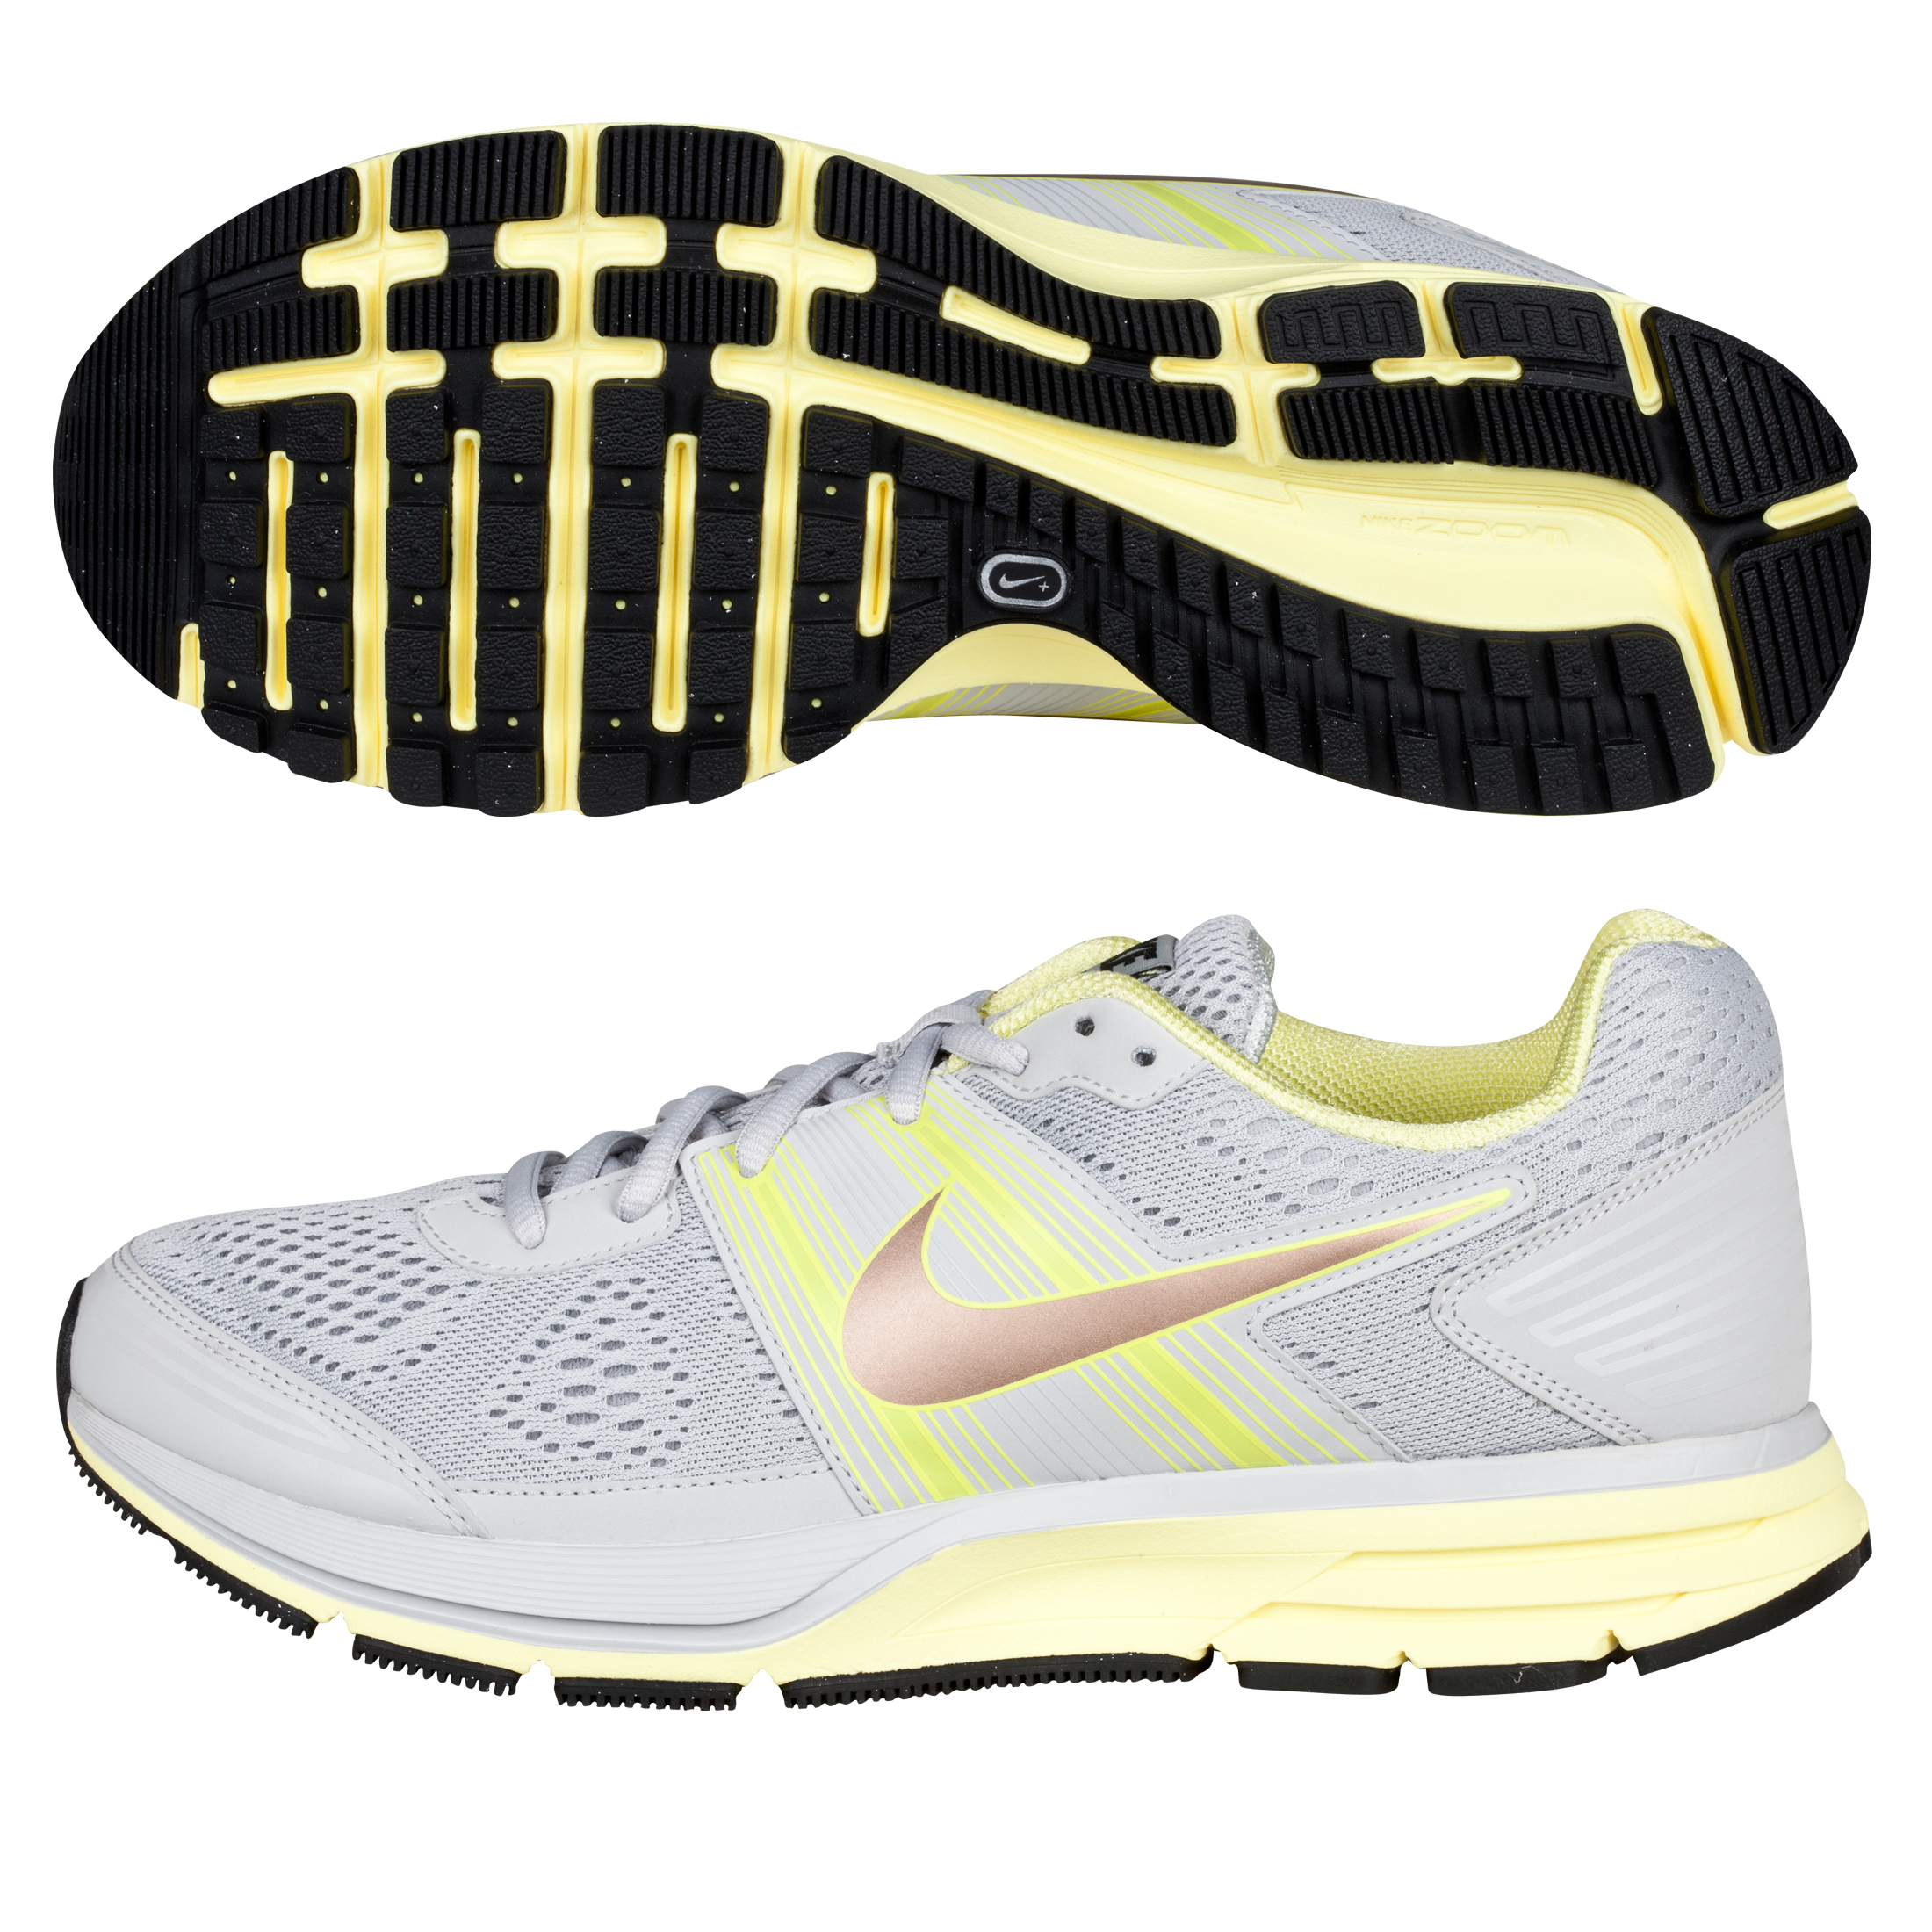 Nike Air Pegasus + 29 Neutral Trainer - Grey/Electric Yellow - Womens